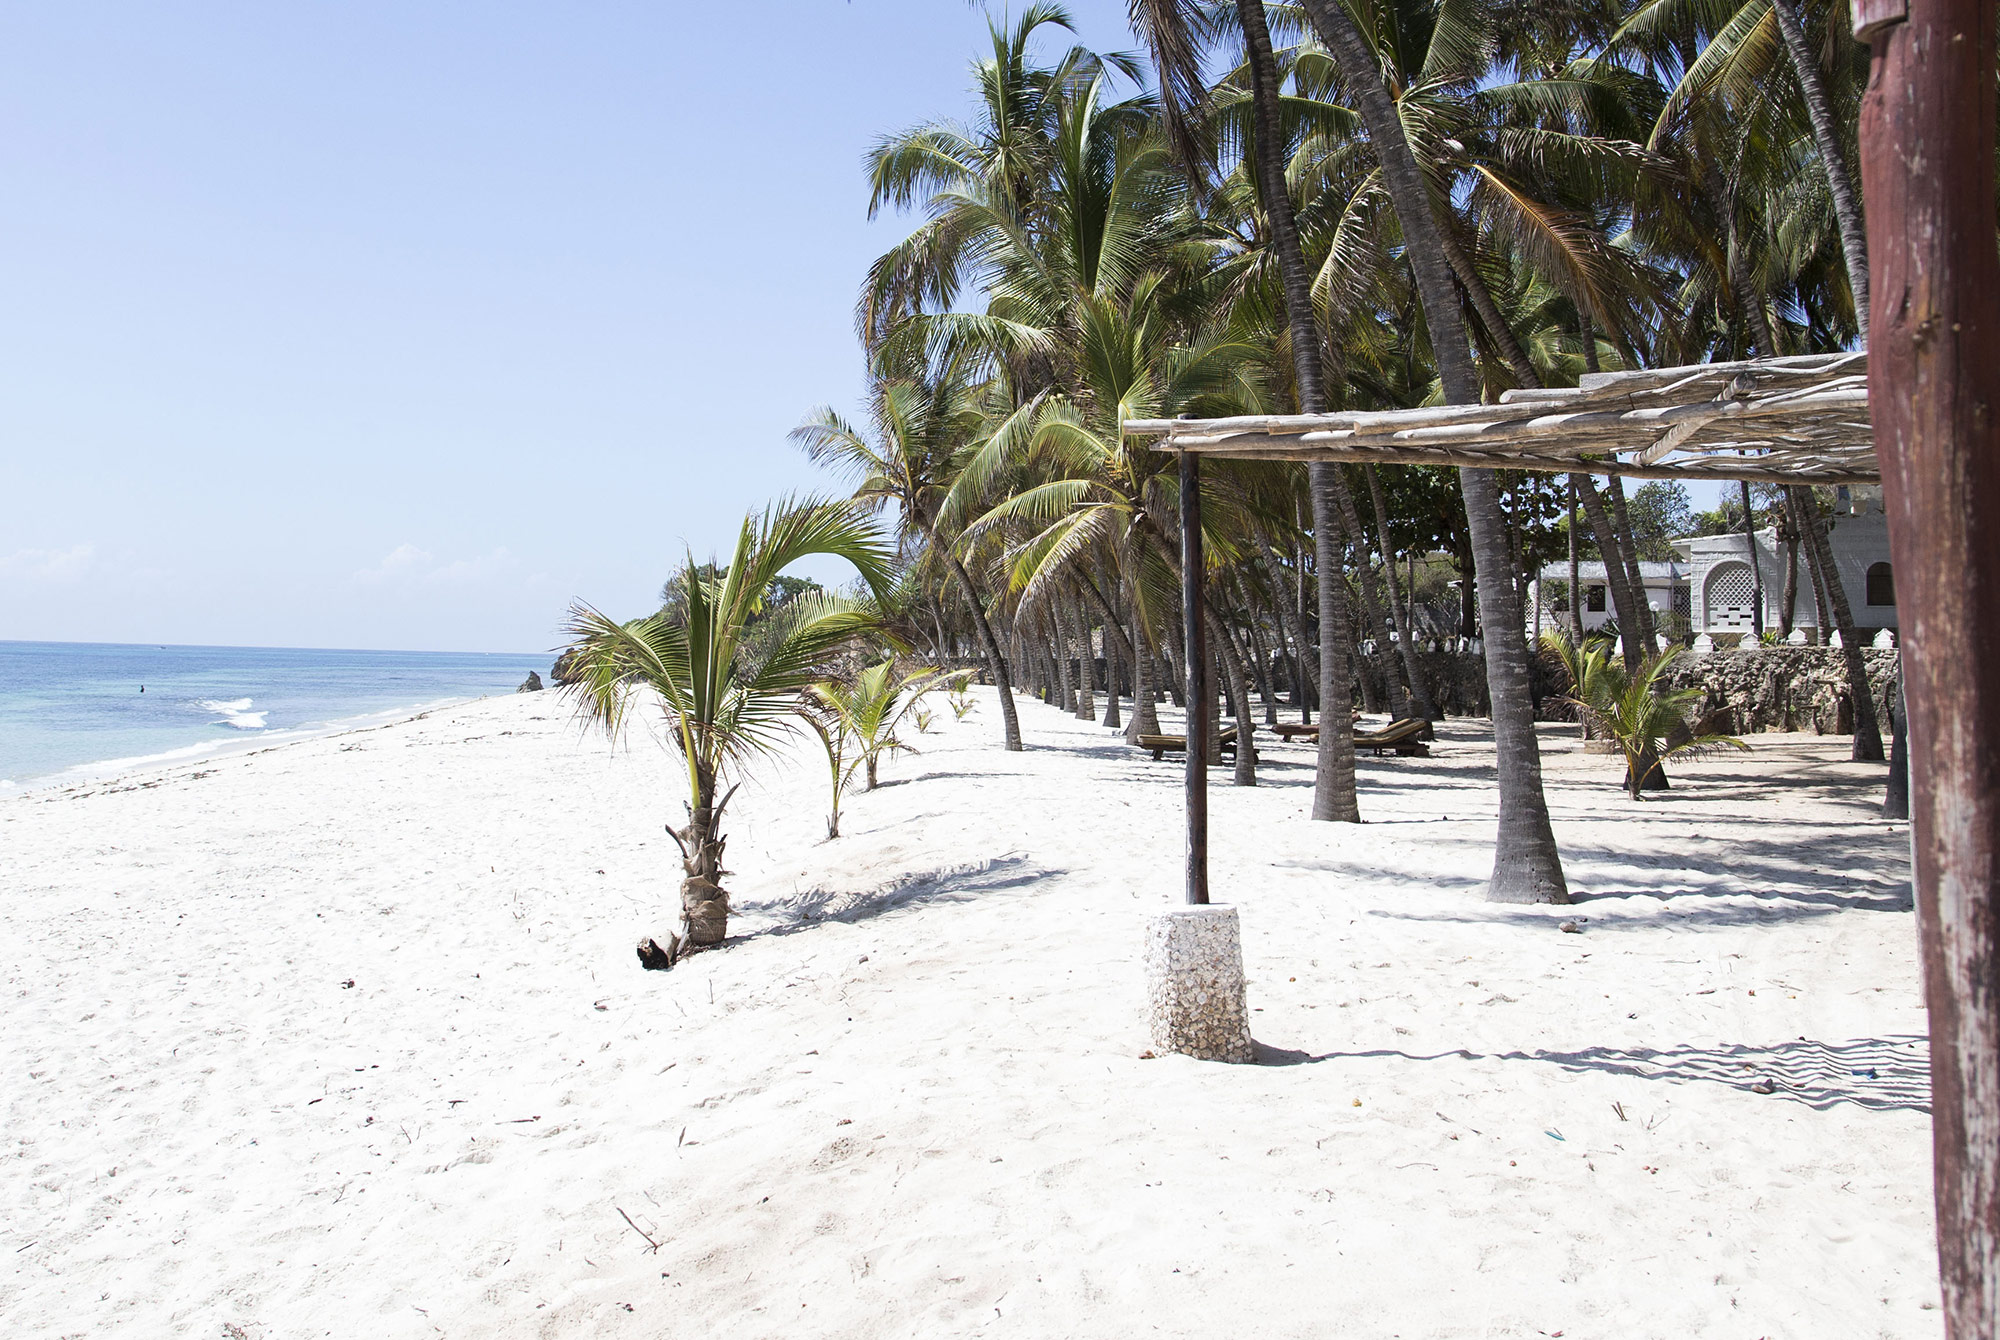 03-KEN_2019_6FWI_Coconut-Beach_OCO1701_2000